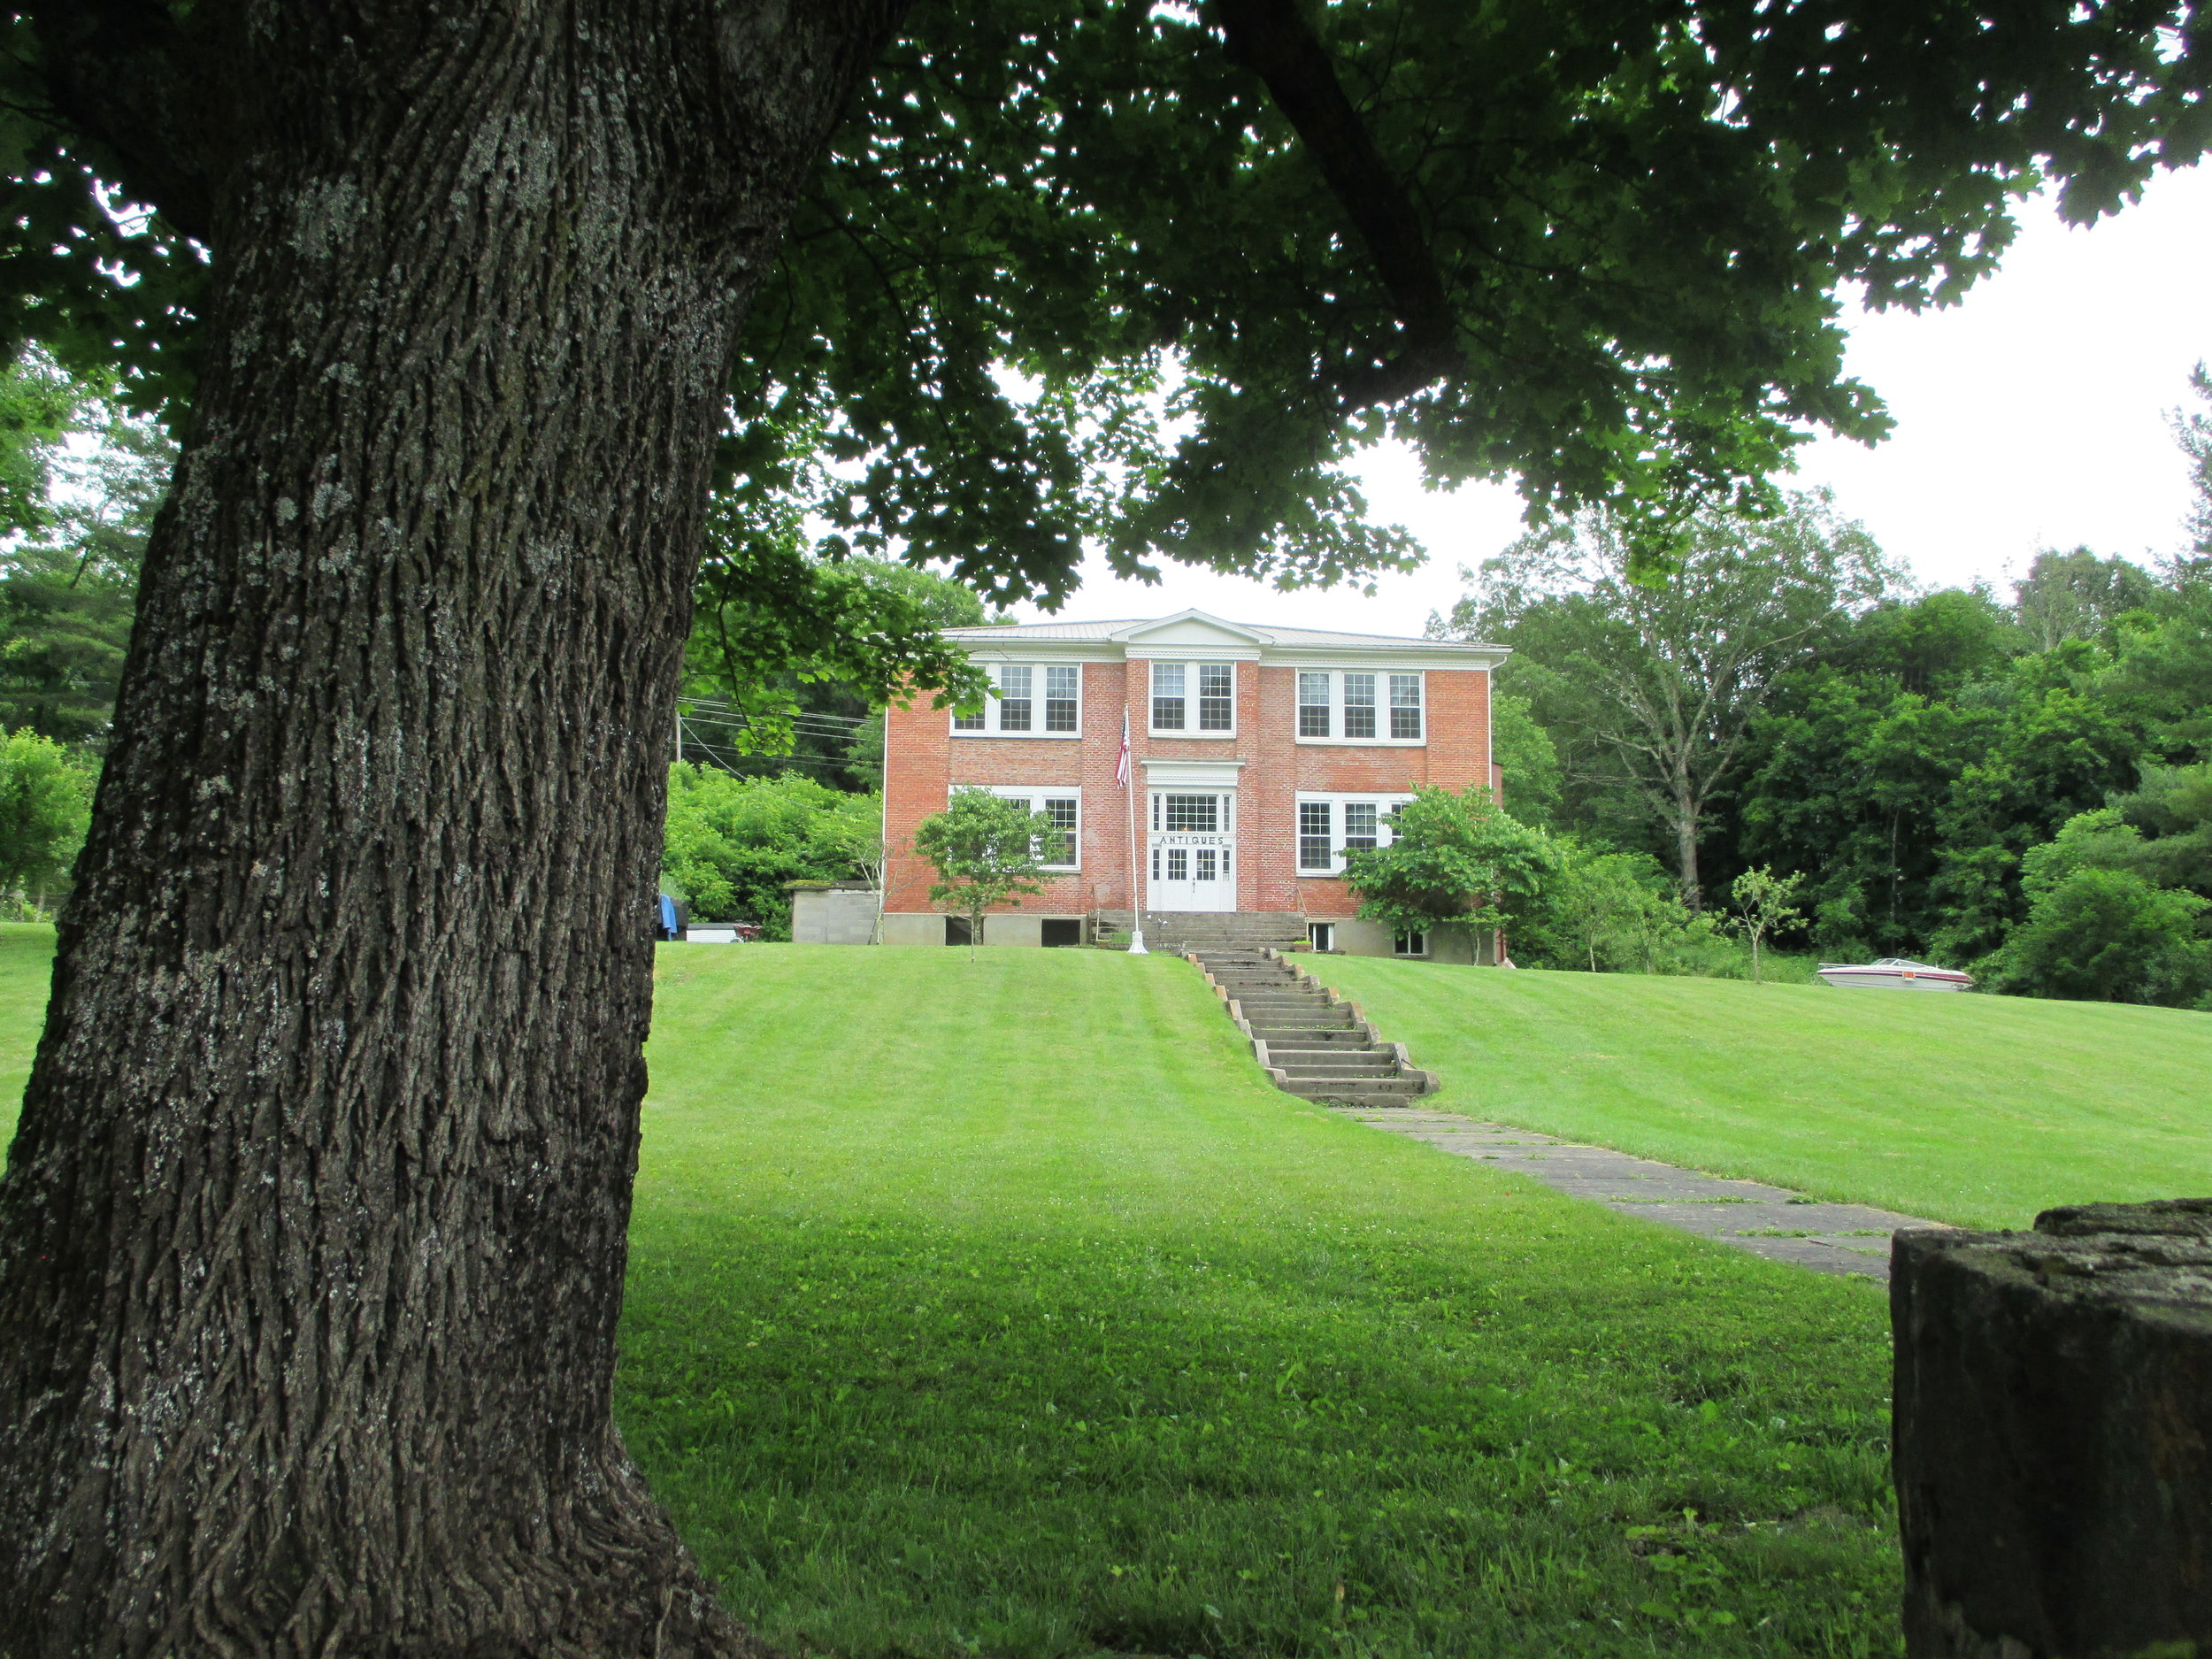 Copy of Exterior View